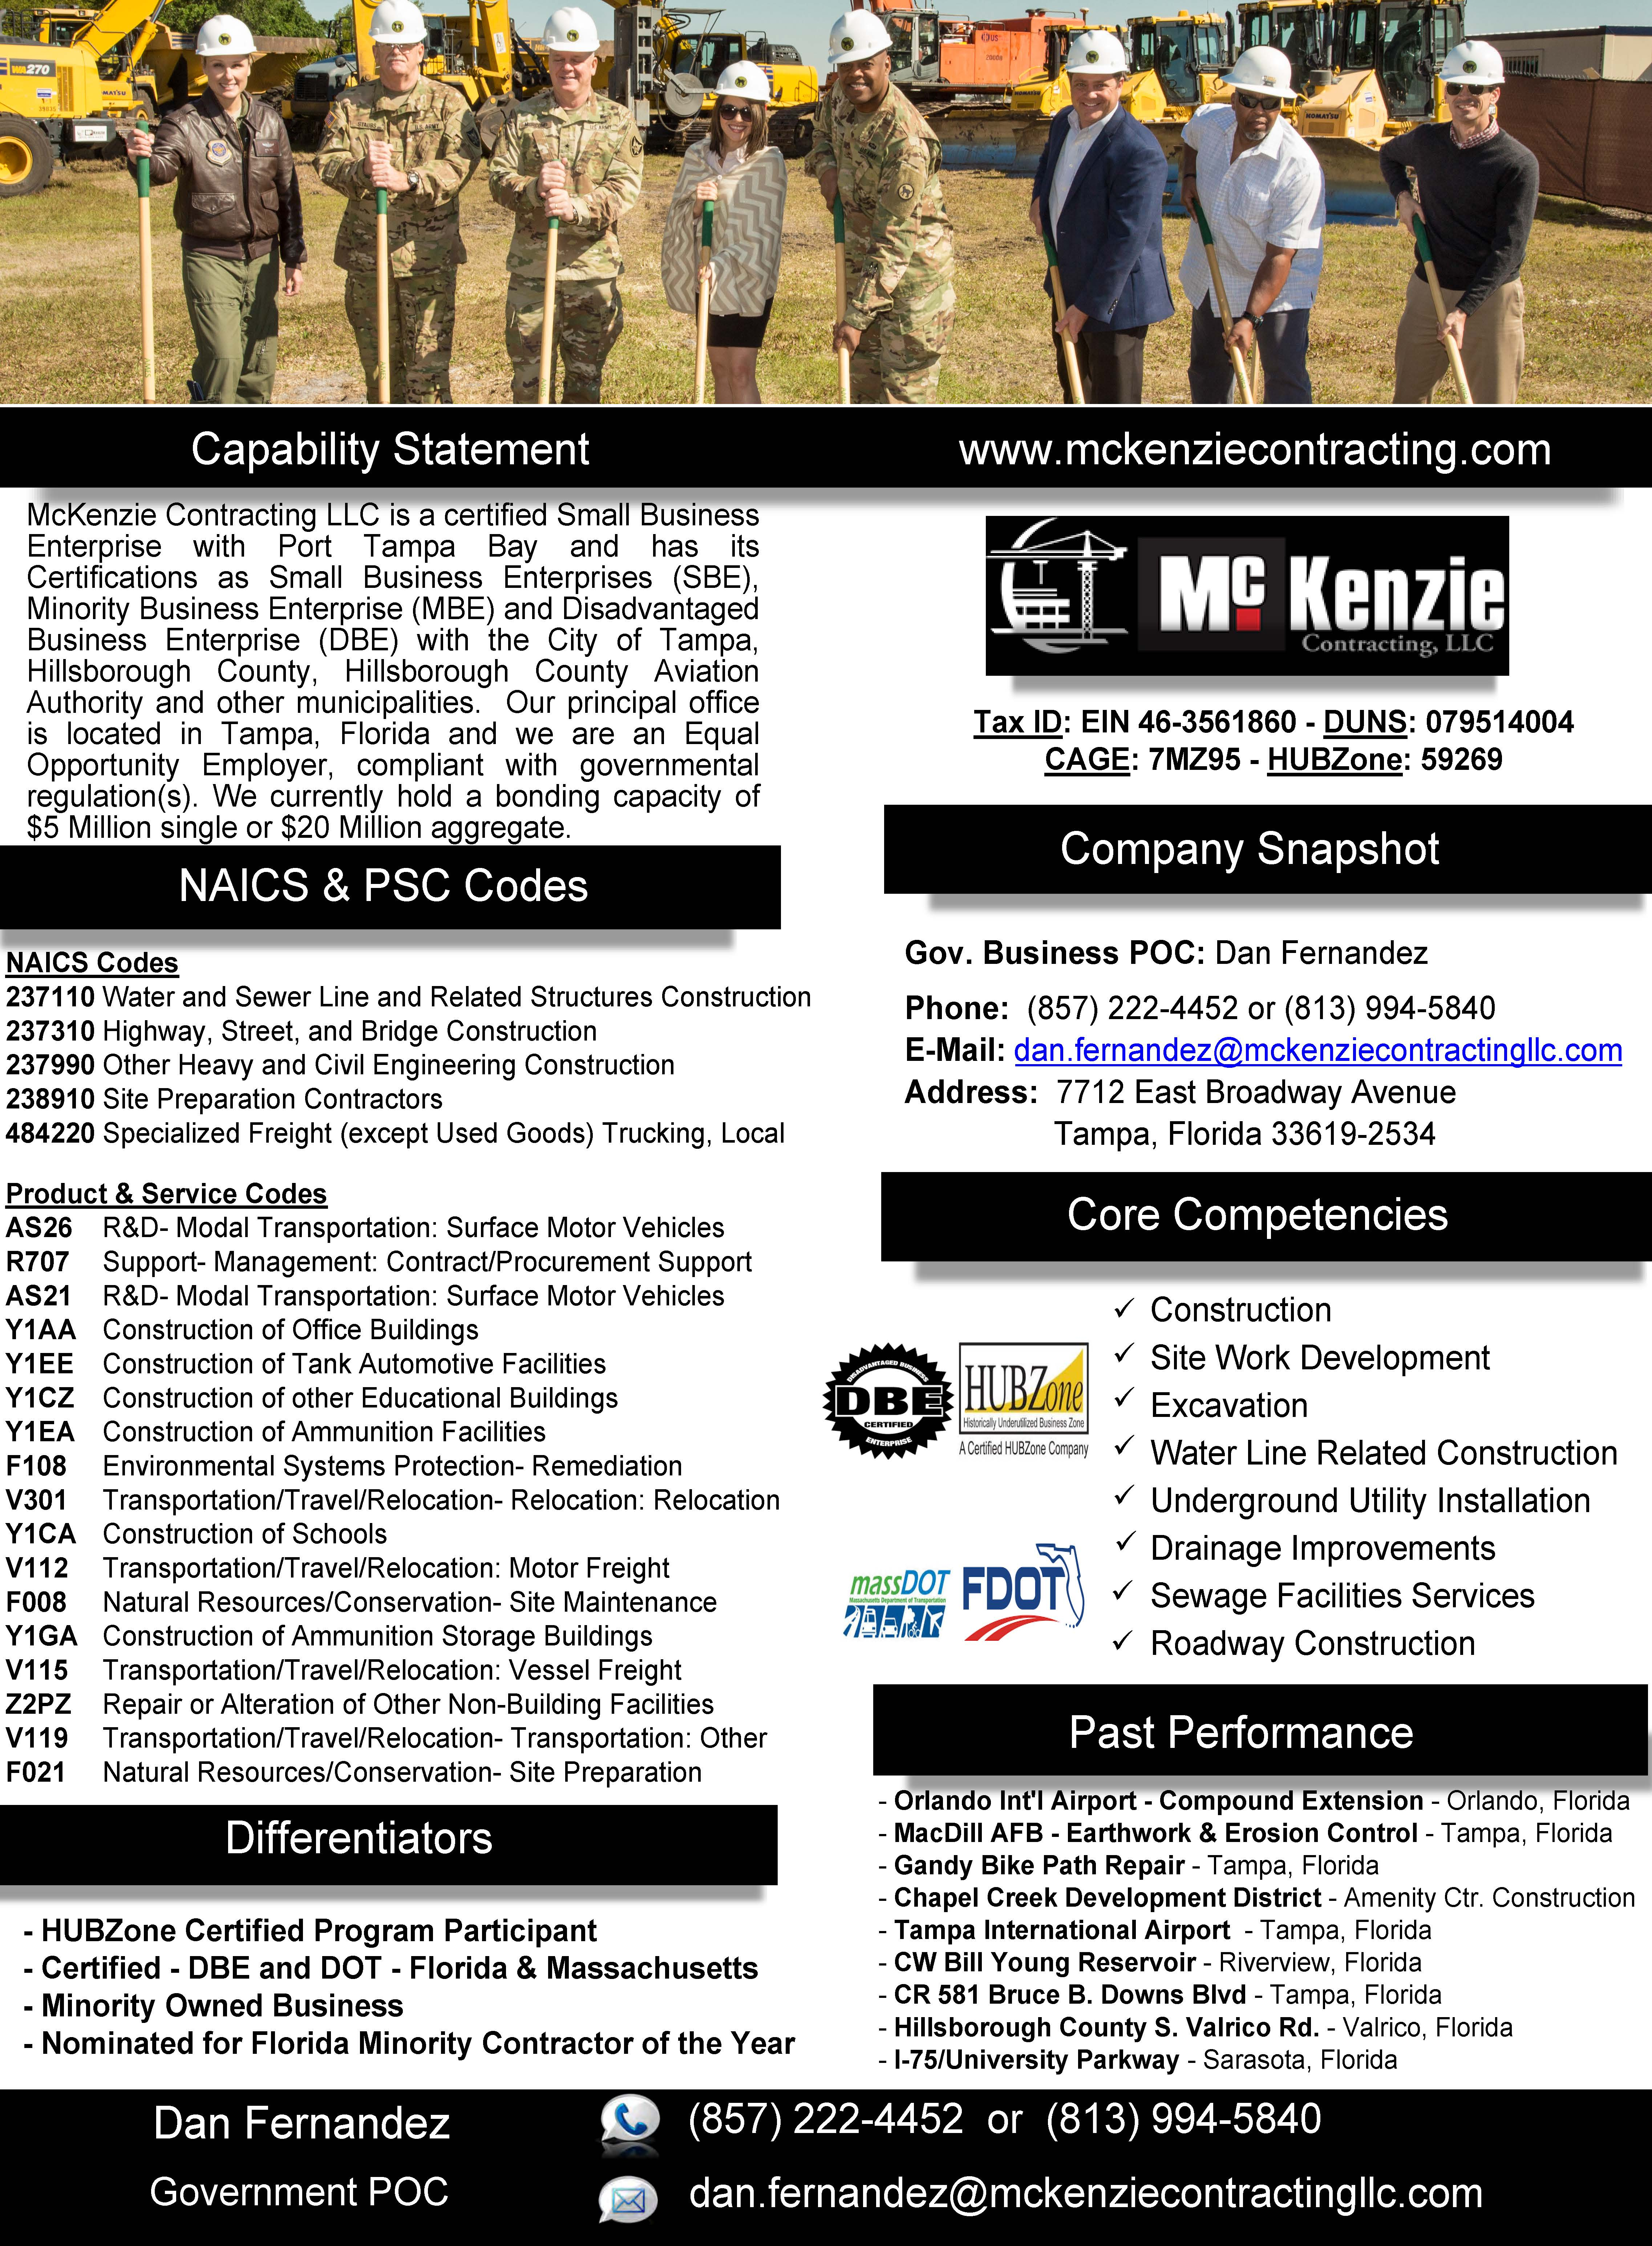 McKenzie Contracting LLC - Capability Statement - Final - 8-23-18